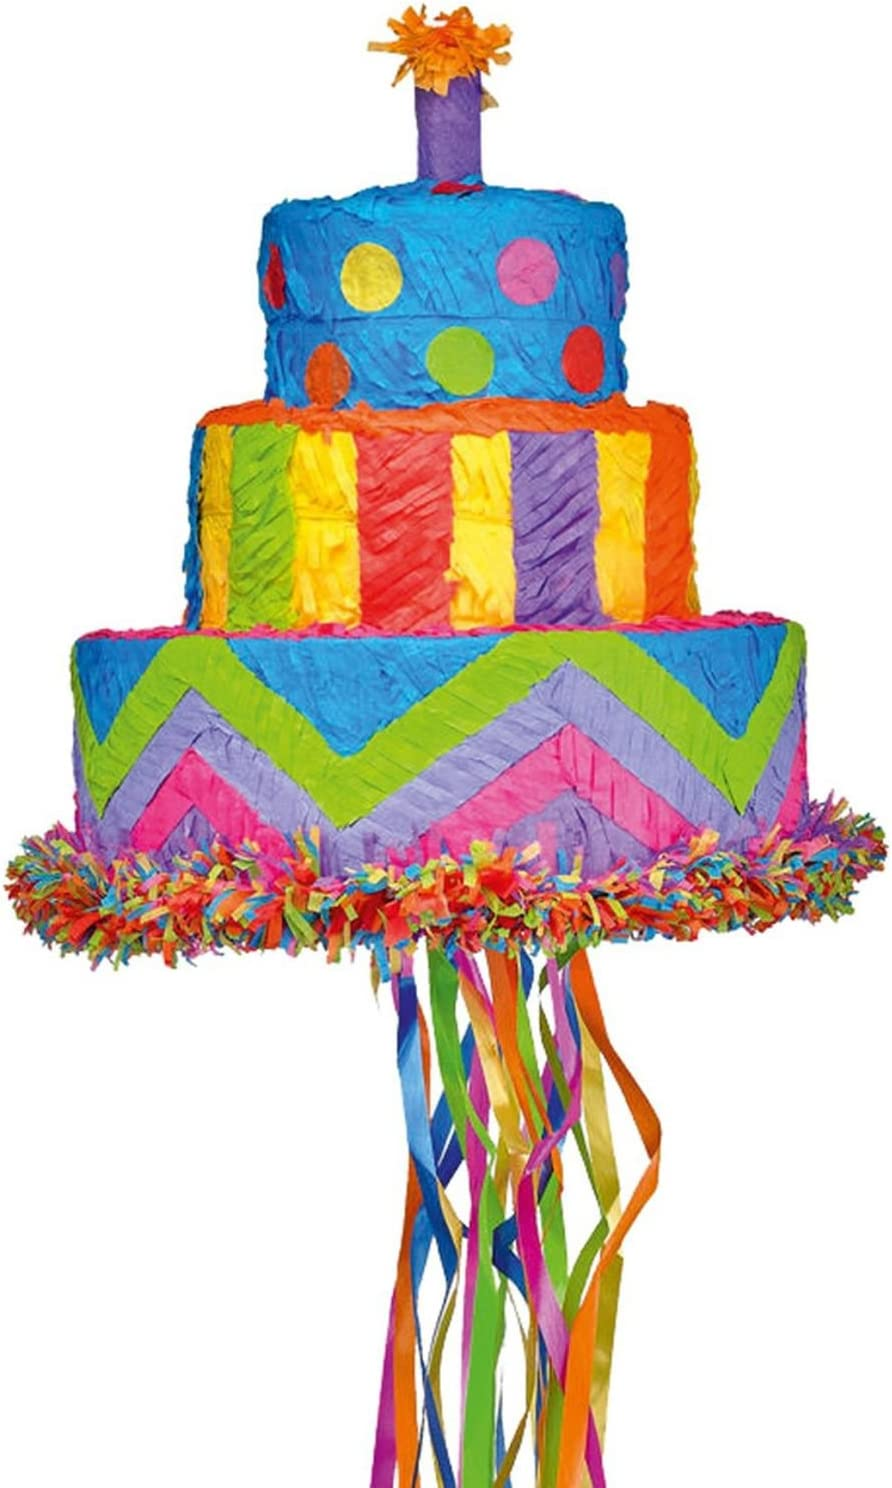 Fantastic Amazon Com Amscan P19699 Accessories Pull Pinata Birthday Cake Funny Birthday Cards Online Elaedamsfinfo